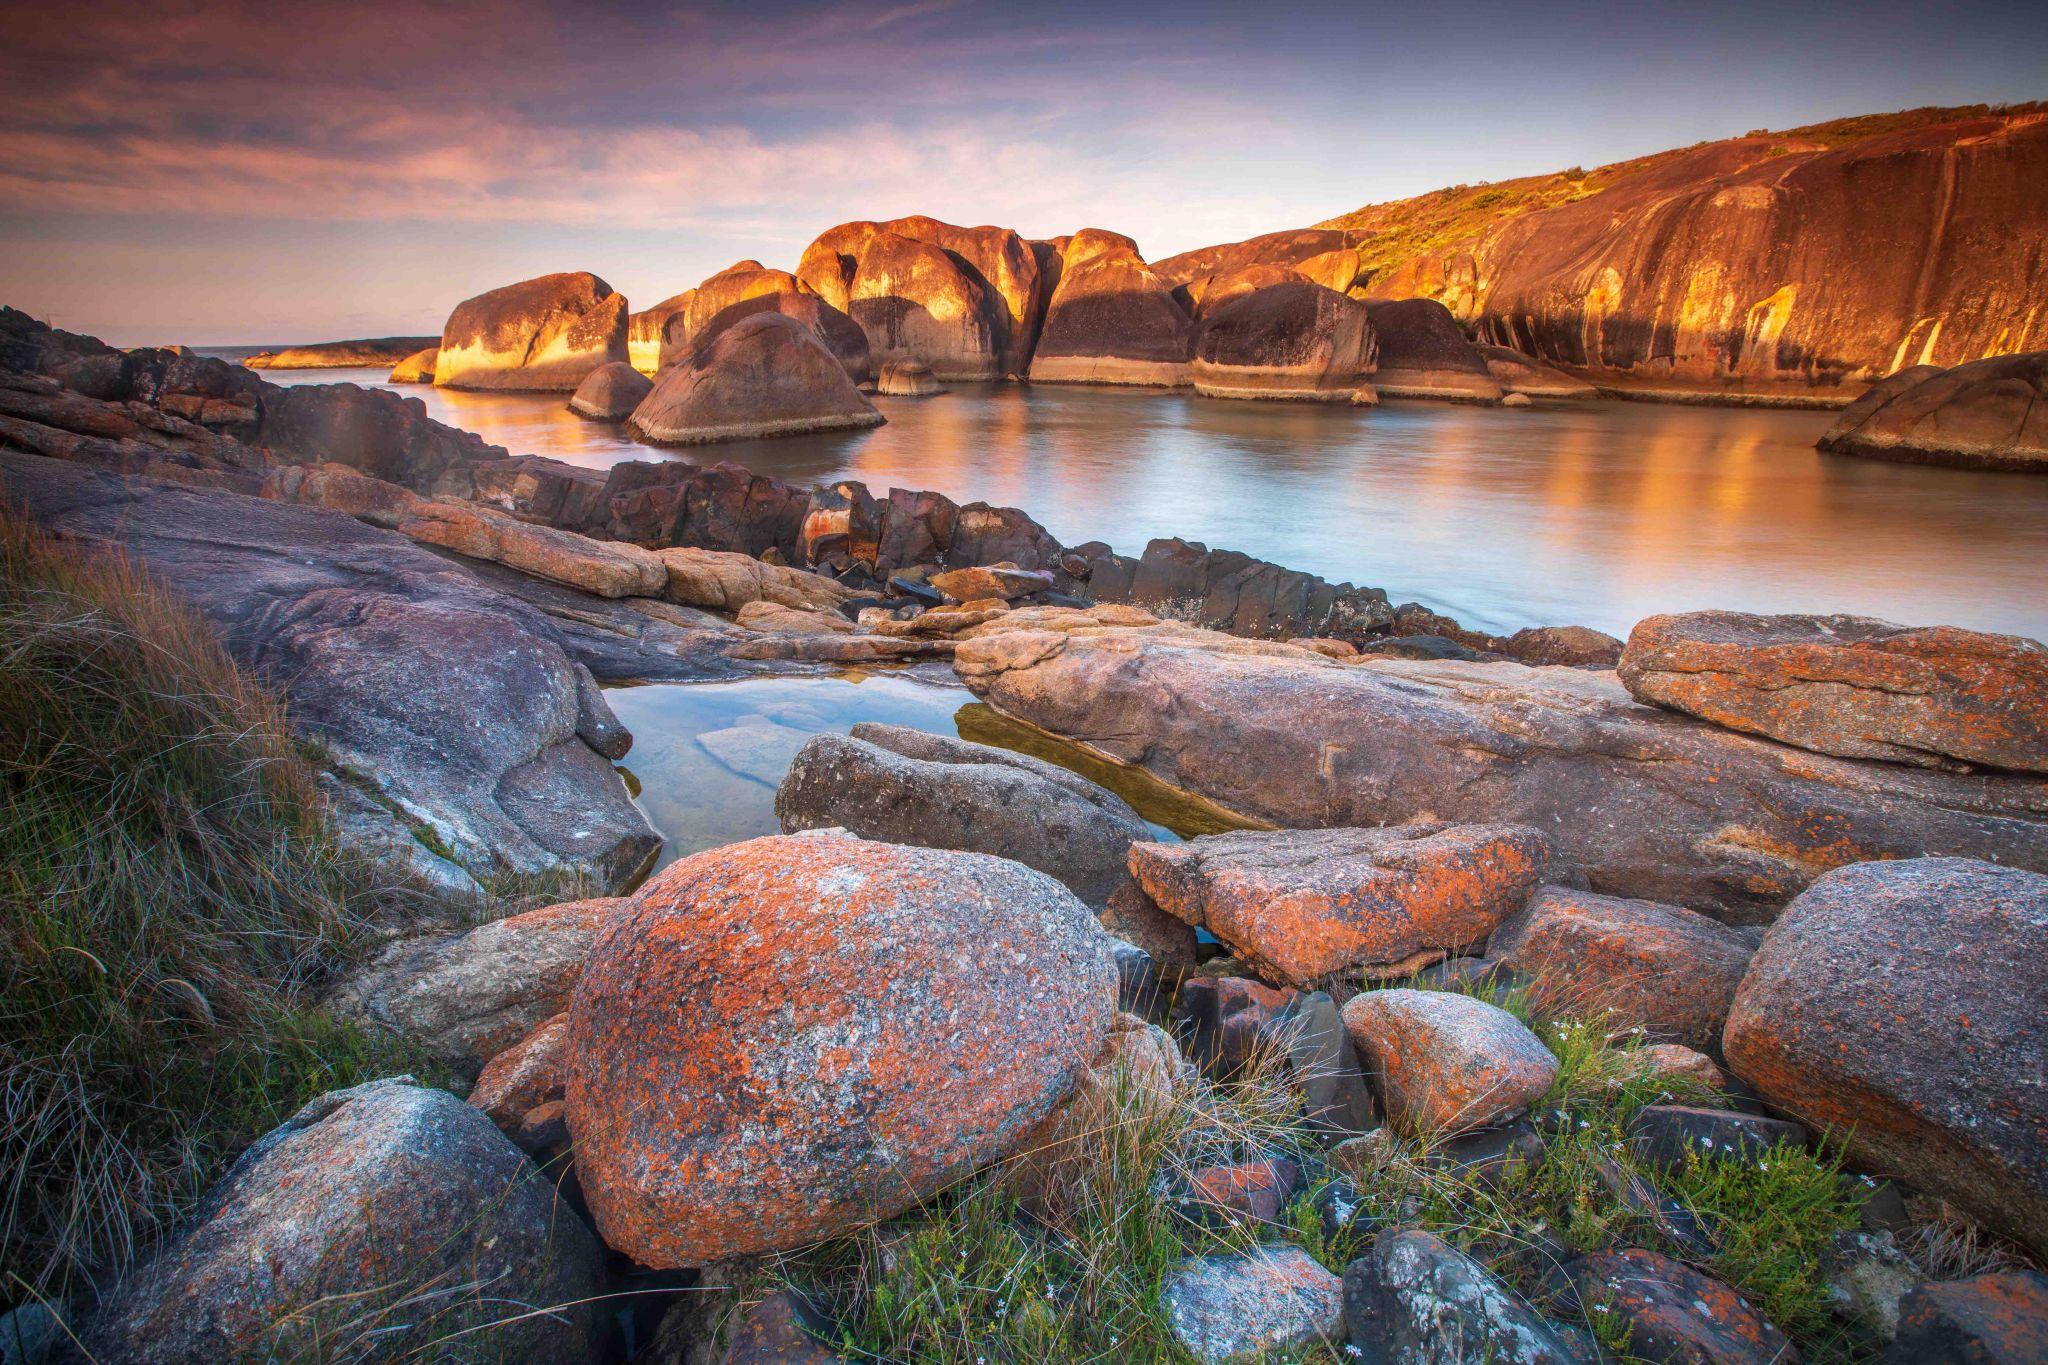 Red Rock, Elephant Rock sunrise Denmark Western Australia, Australia